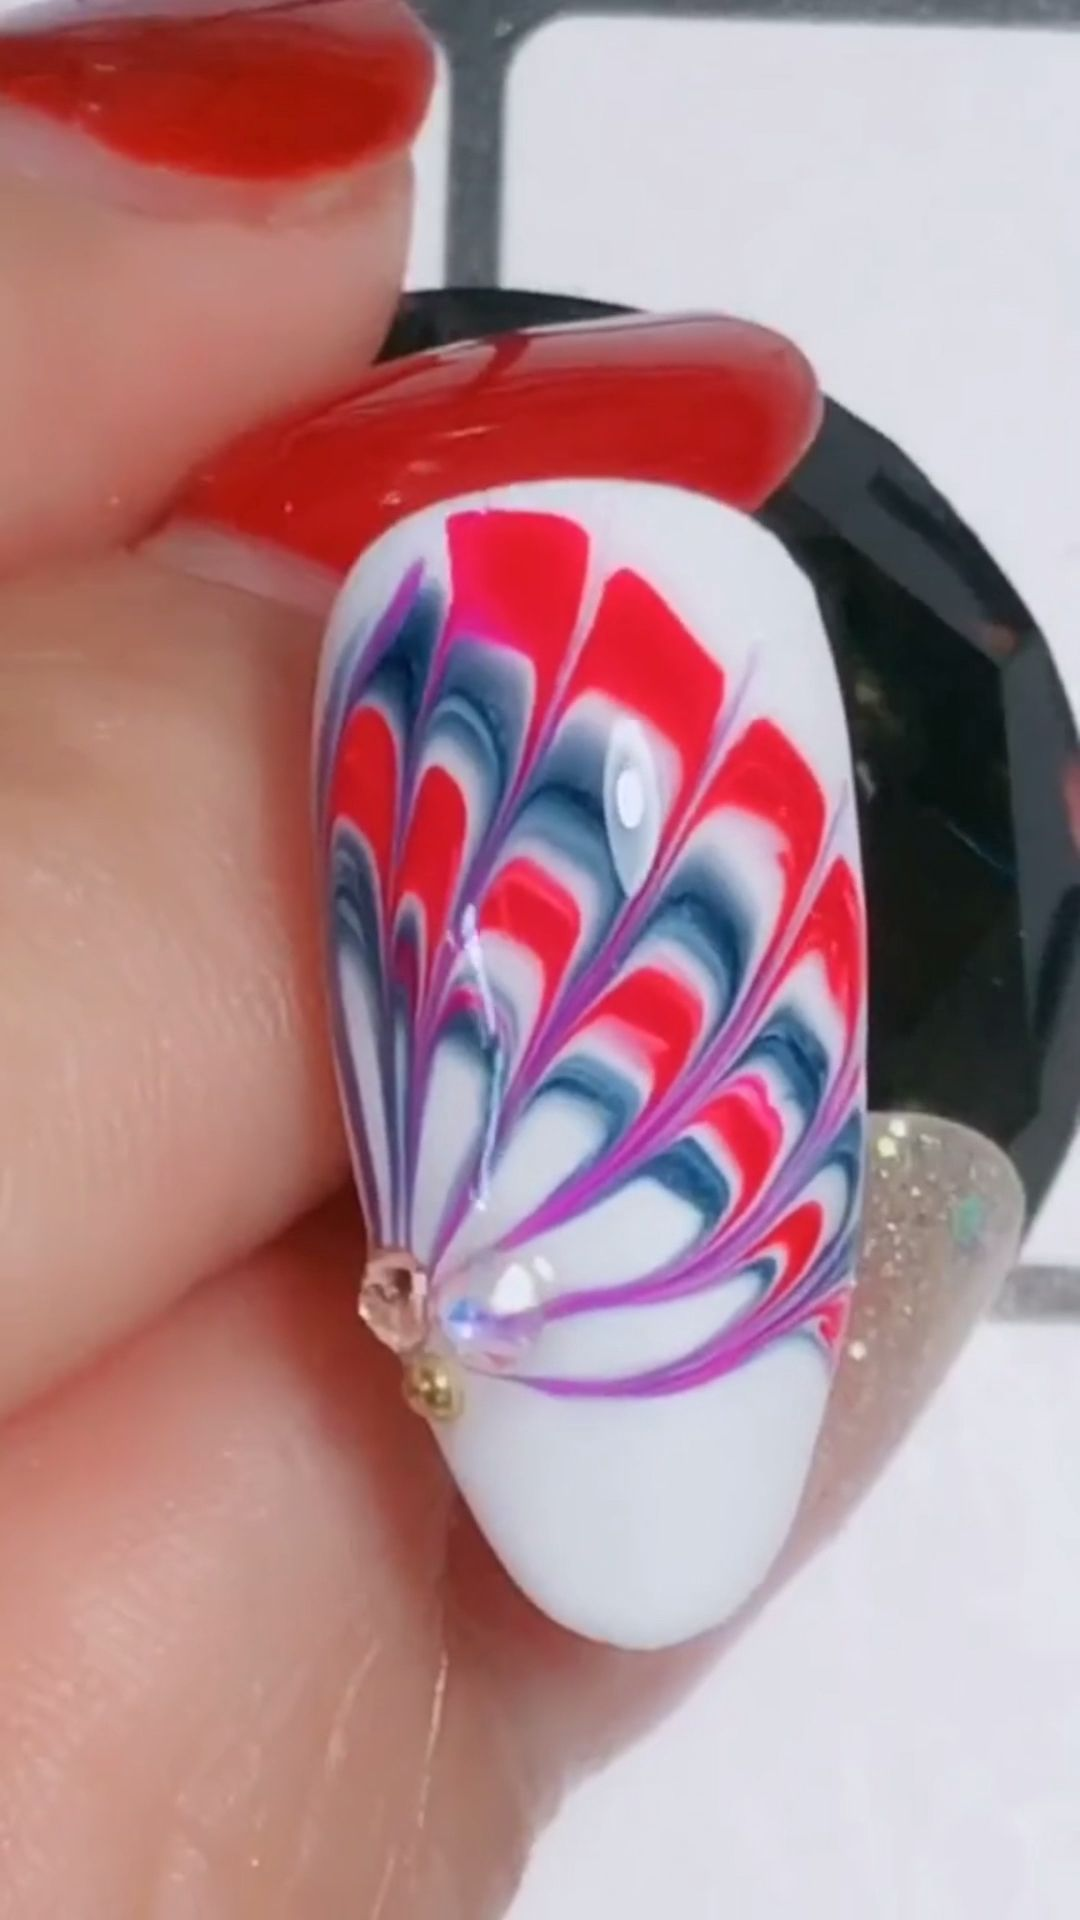 Simple nails art design video Tutorials Compilation Part 115 #christmasmargarita